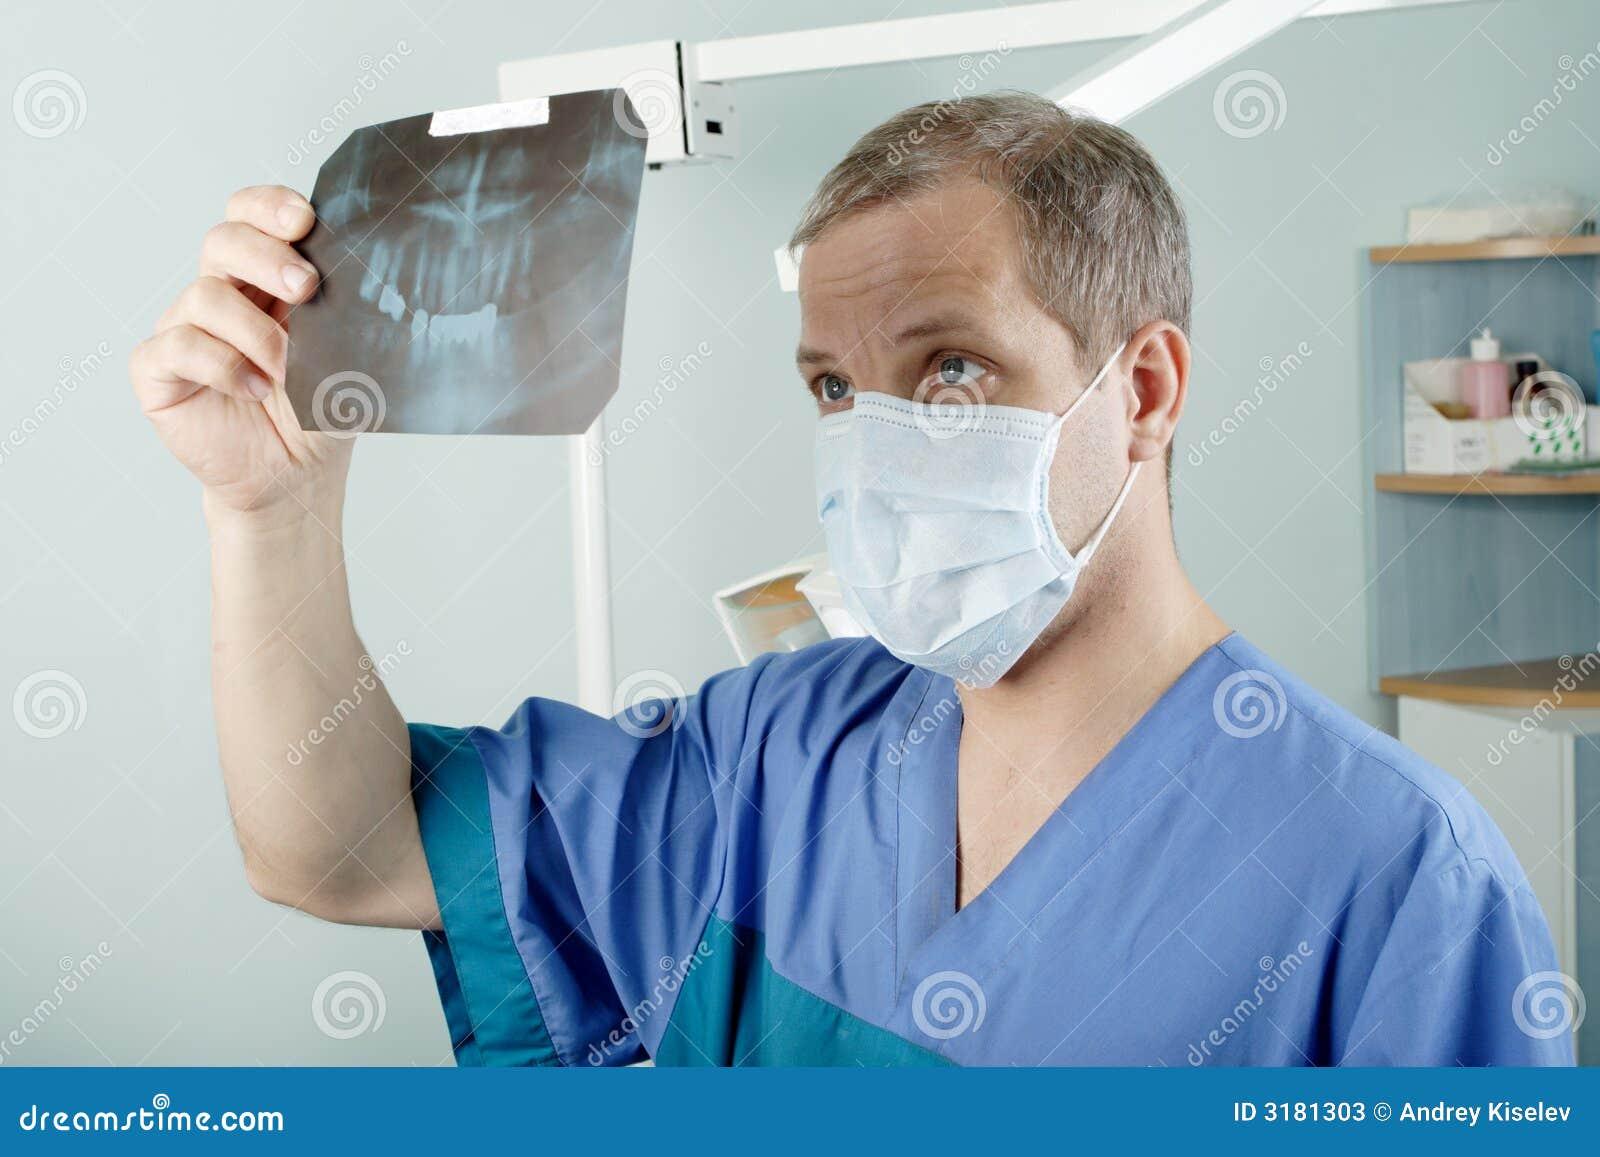 X dentale